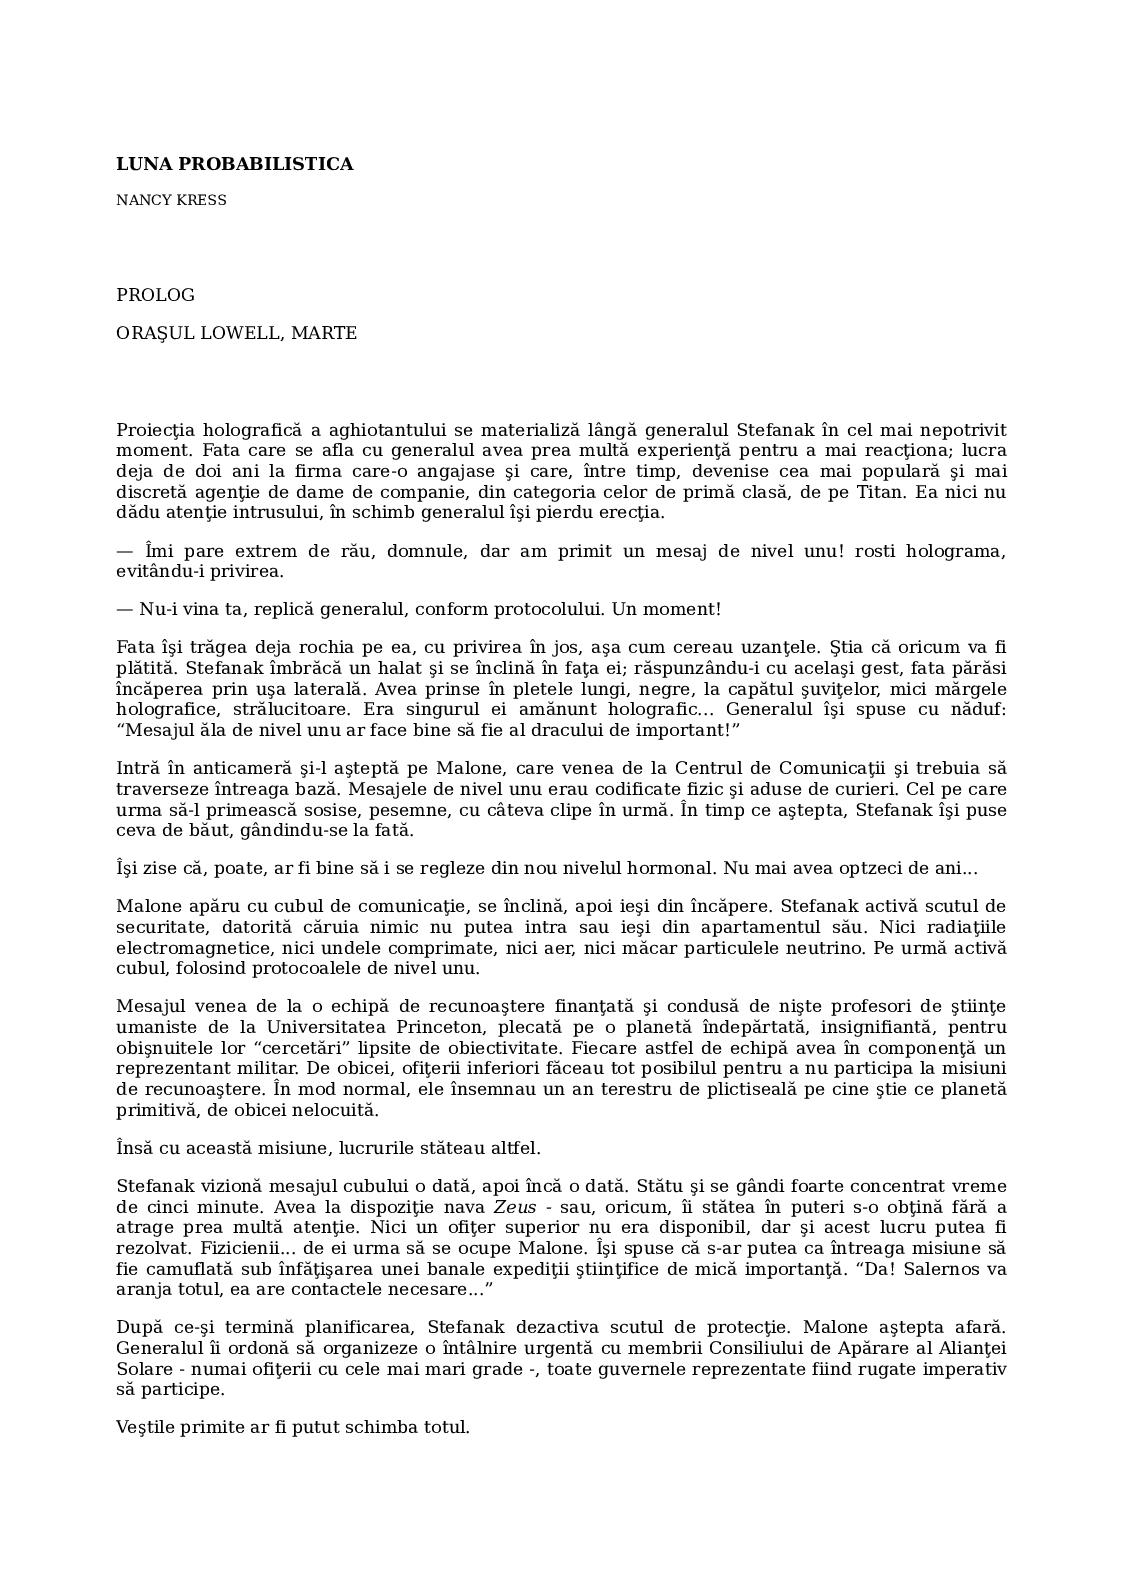 Parasites 12 Detox Forte - Herbagetica, 60 capsule (Parazitoze) - info-tecuci.ro